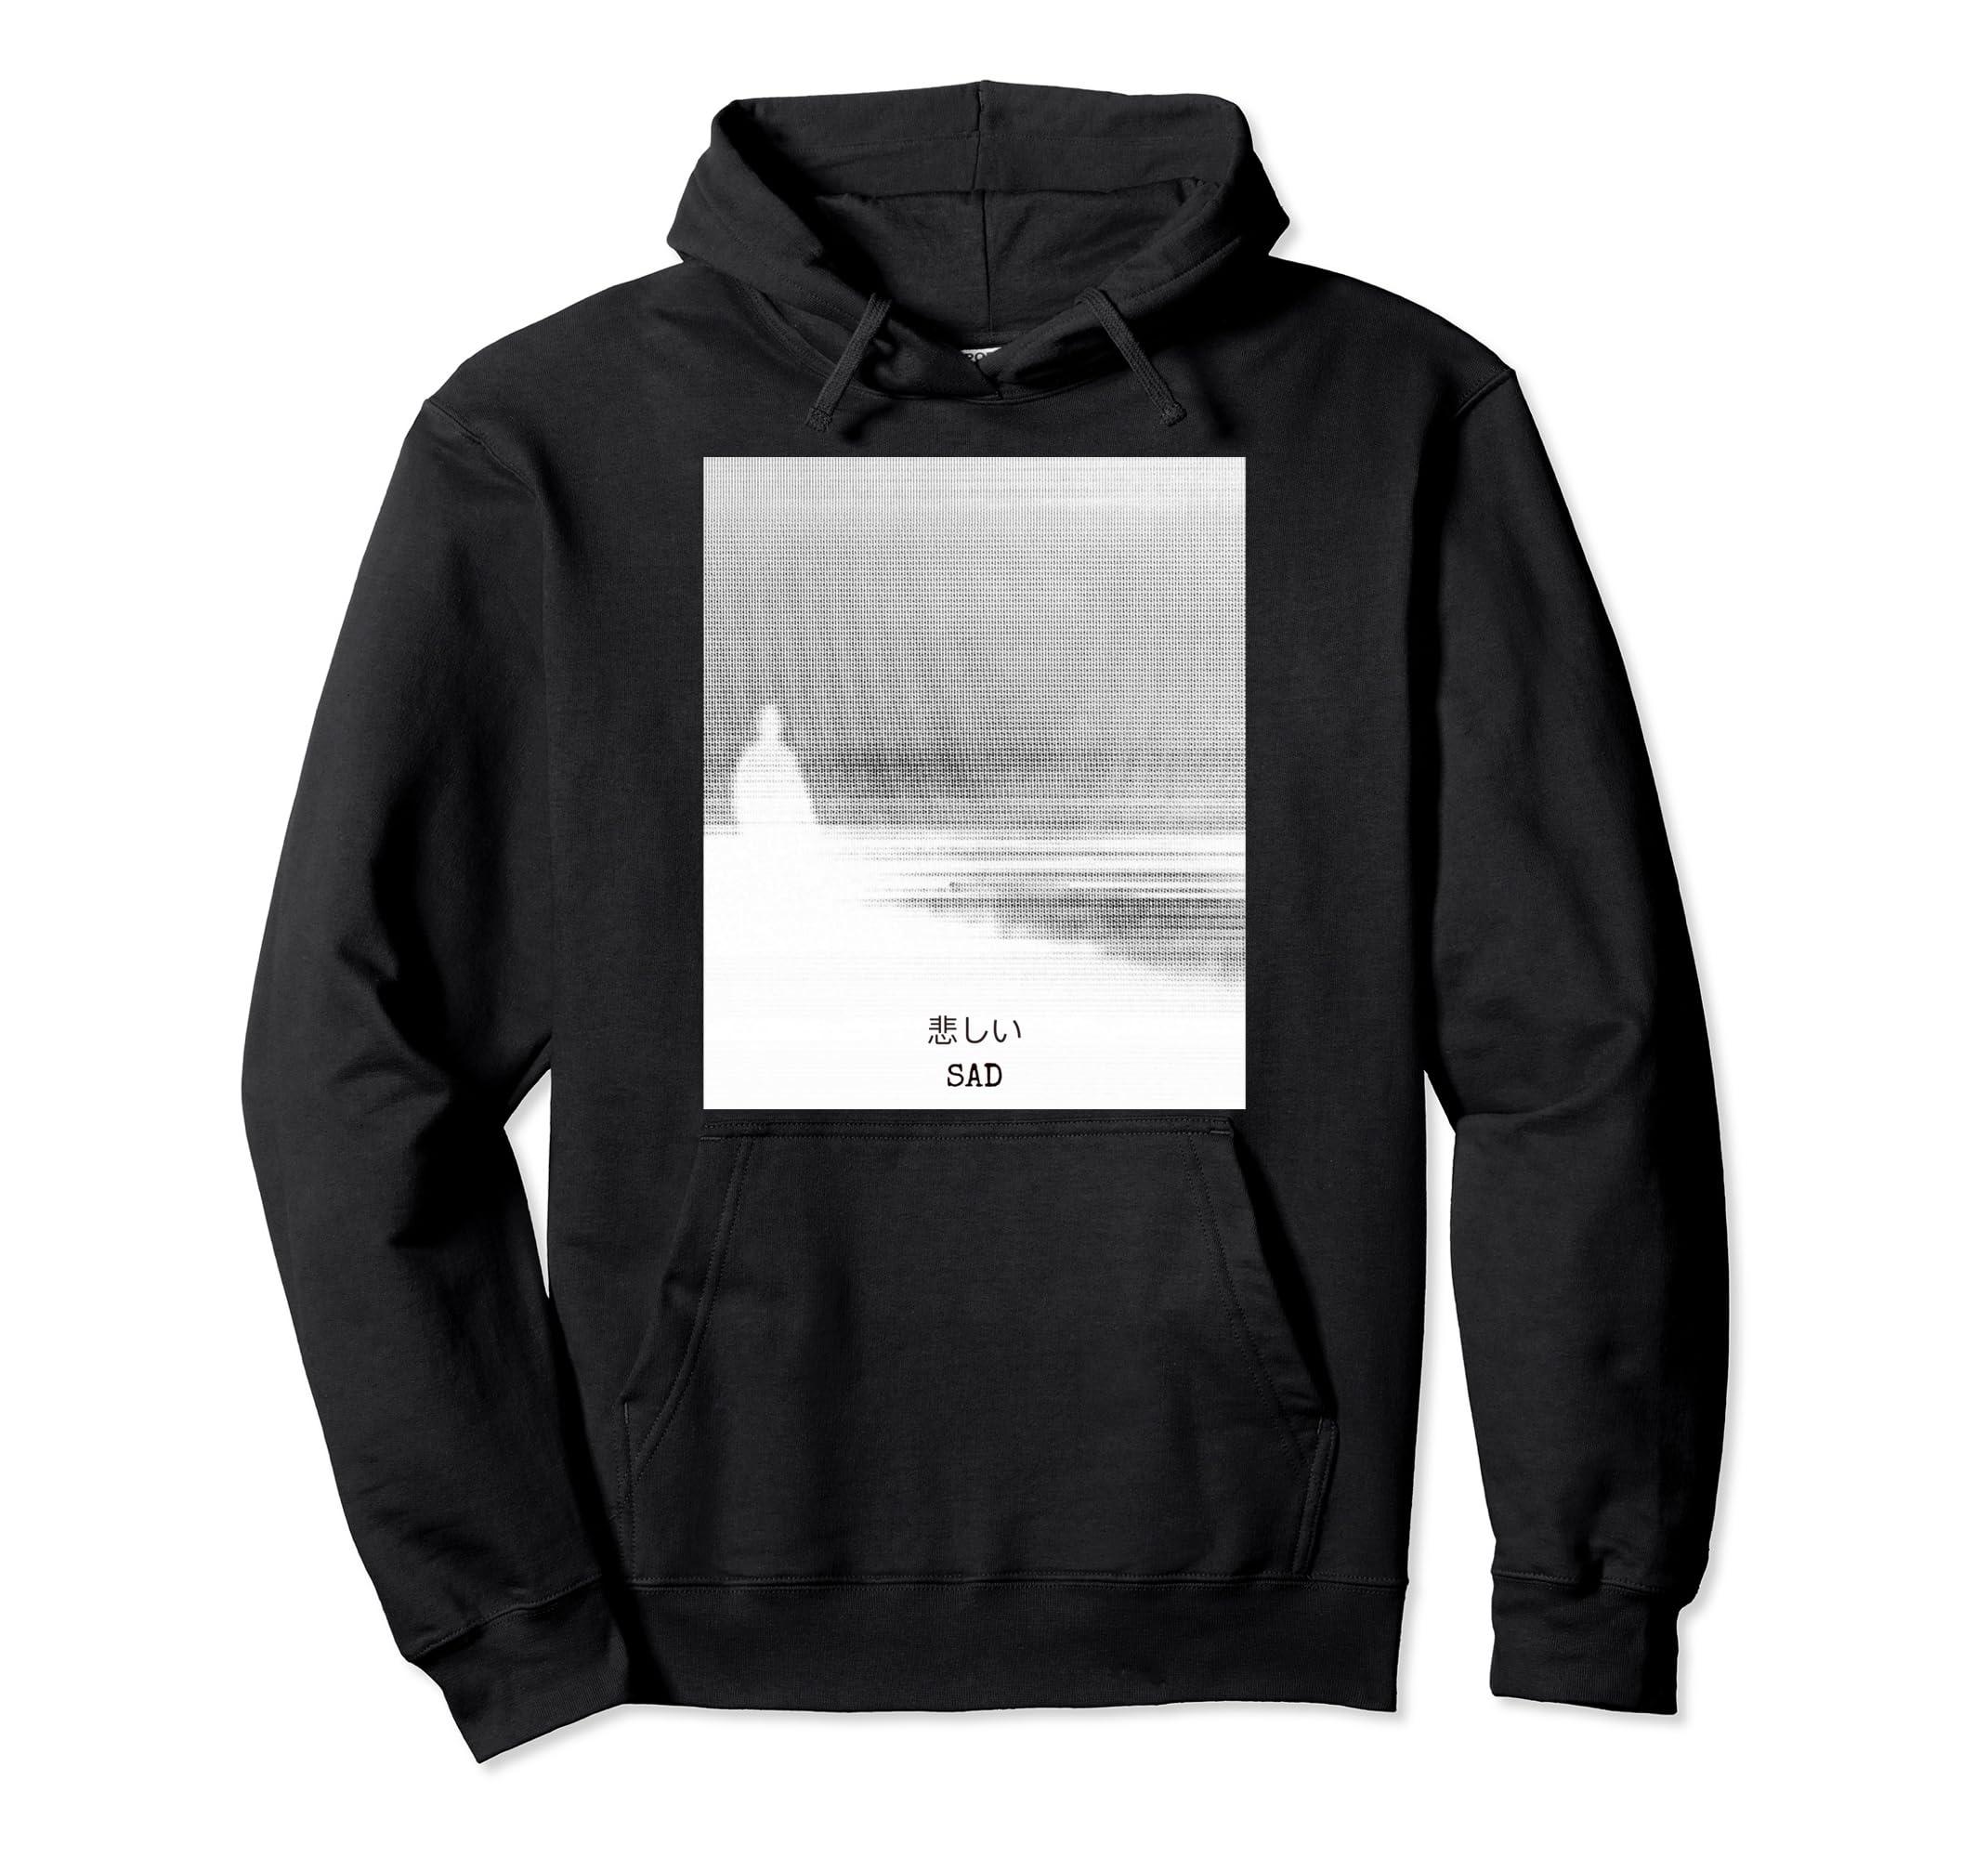 Amazon com: Sad Vaporwave Aesthetic Hoodie: Clothing